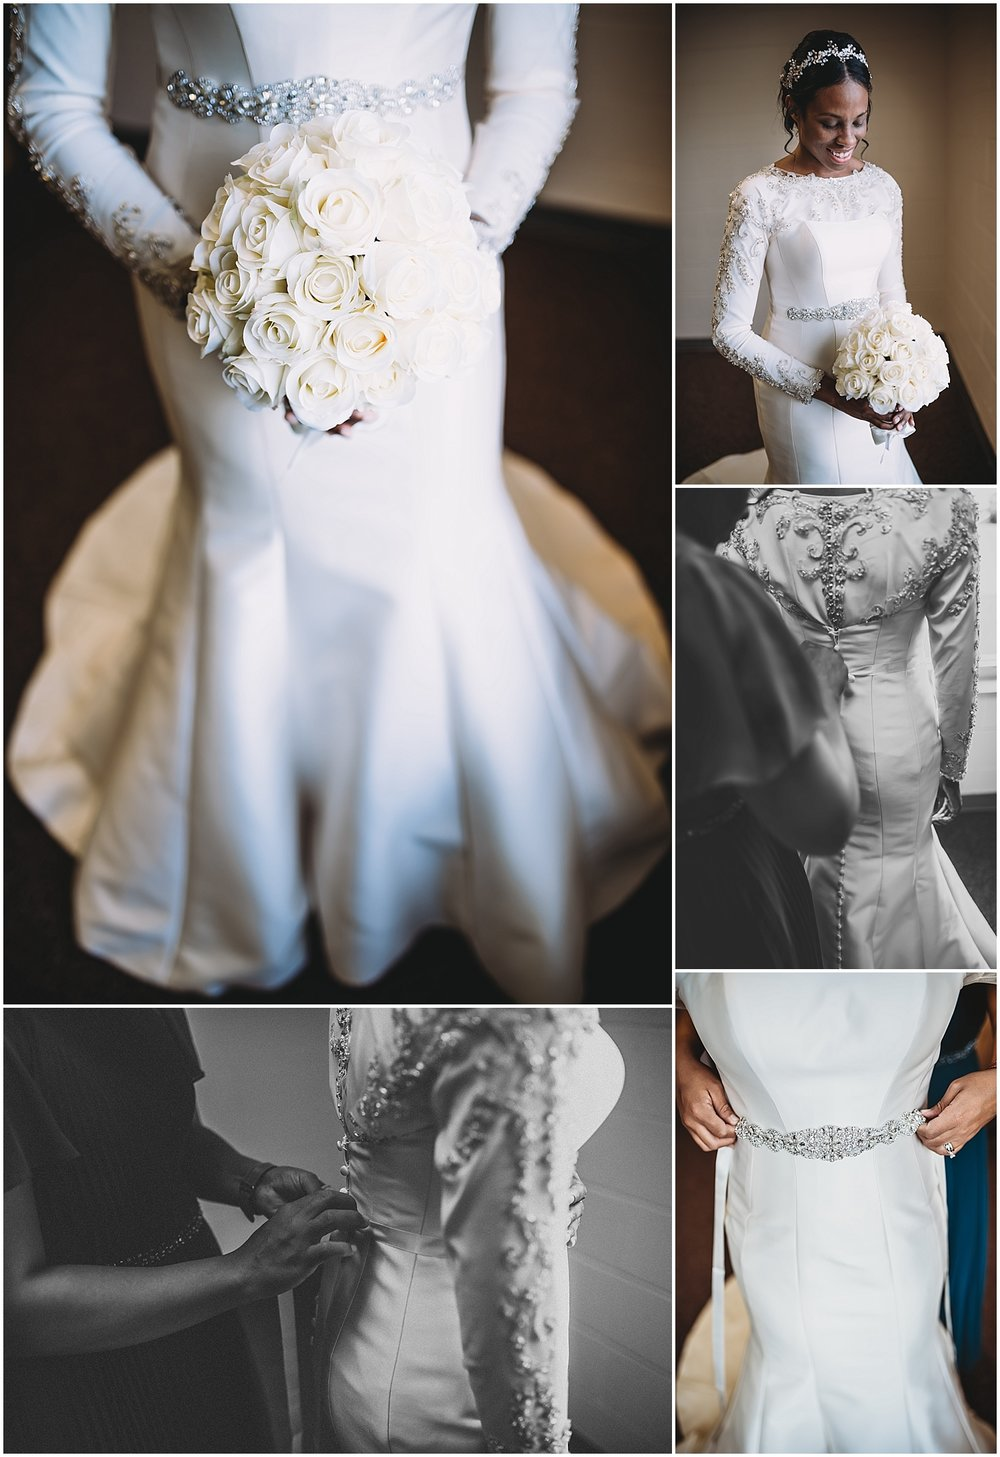 NEPA-Scranton-wedding-engagement-photographer-in-York-PA-Central-PA_0105.jpg